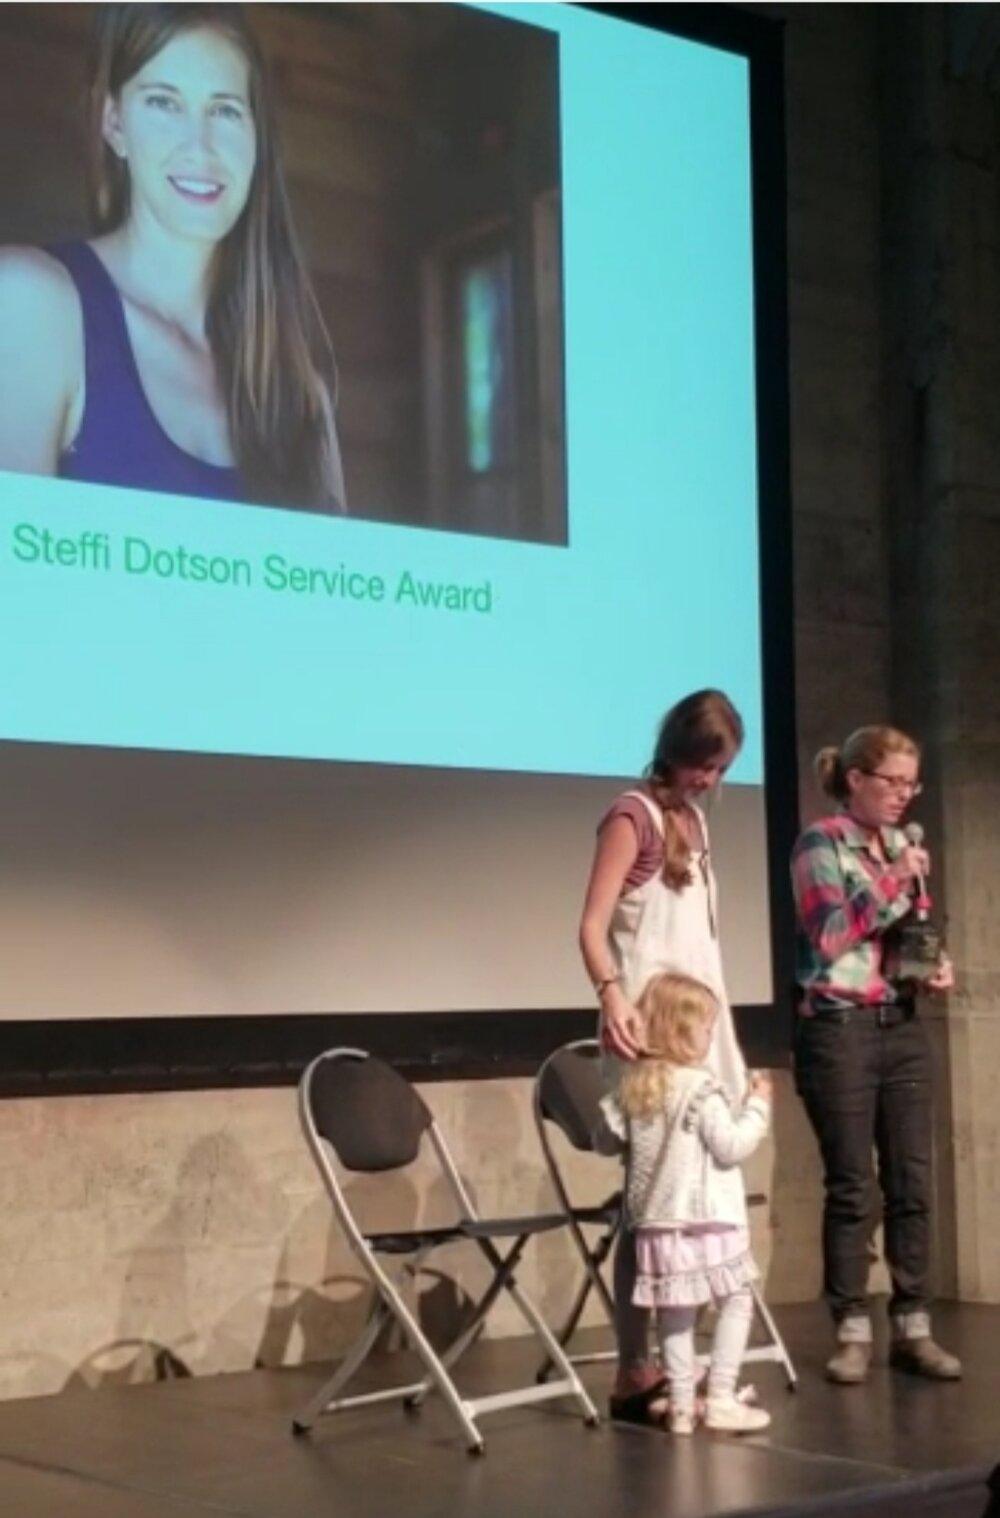 Steffi Dotson Award Ceremony